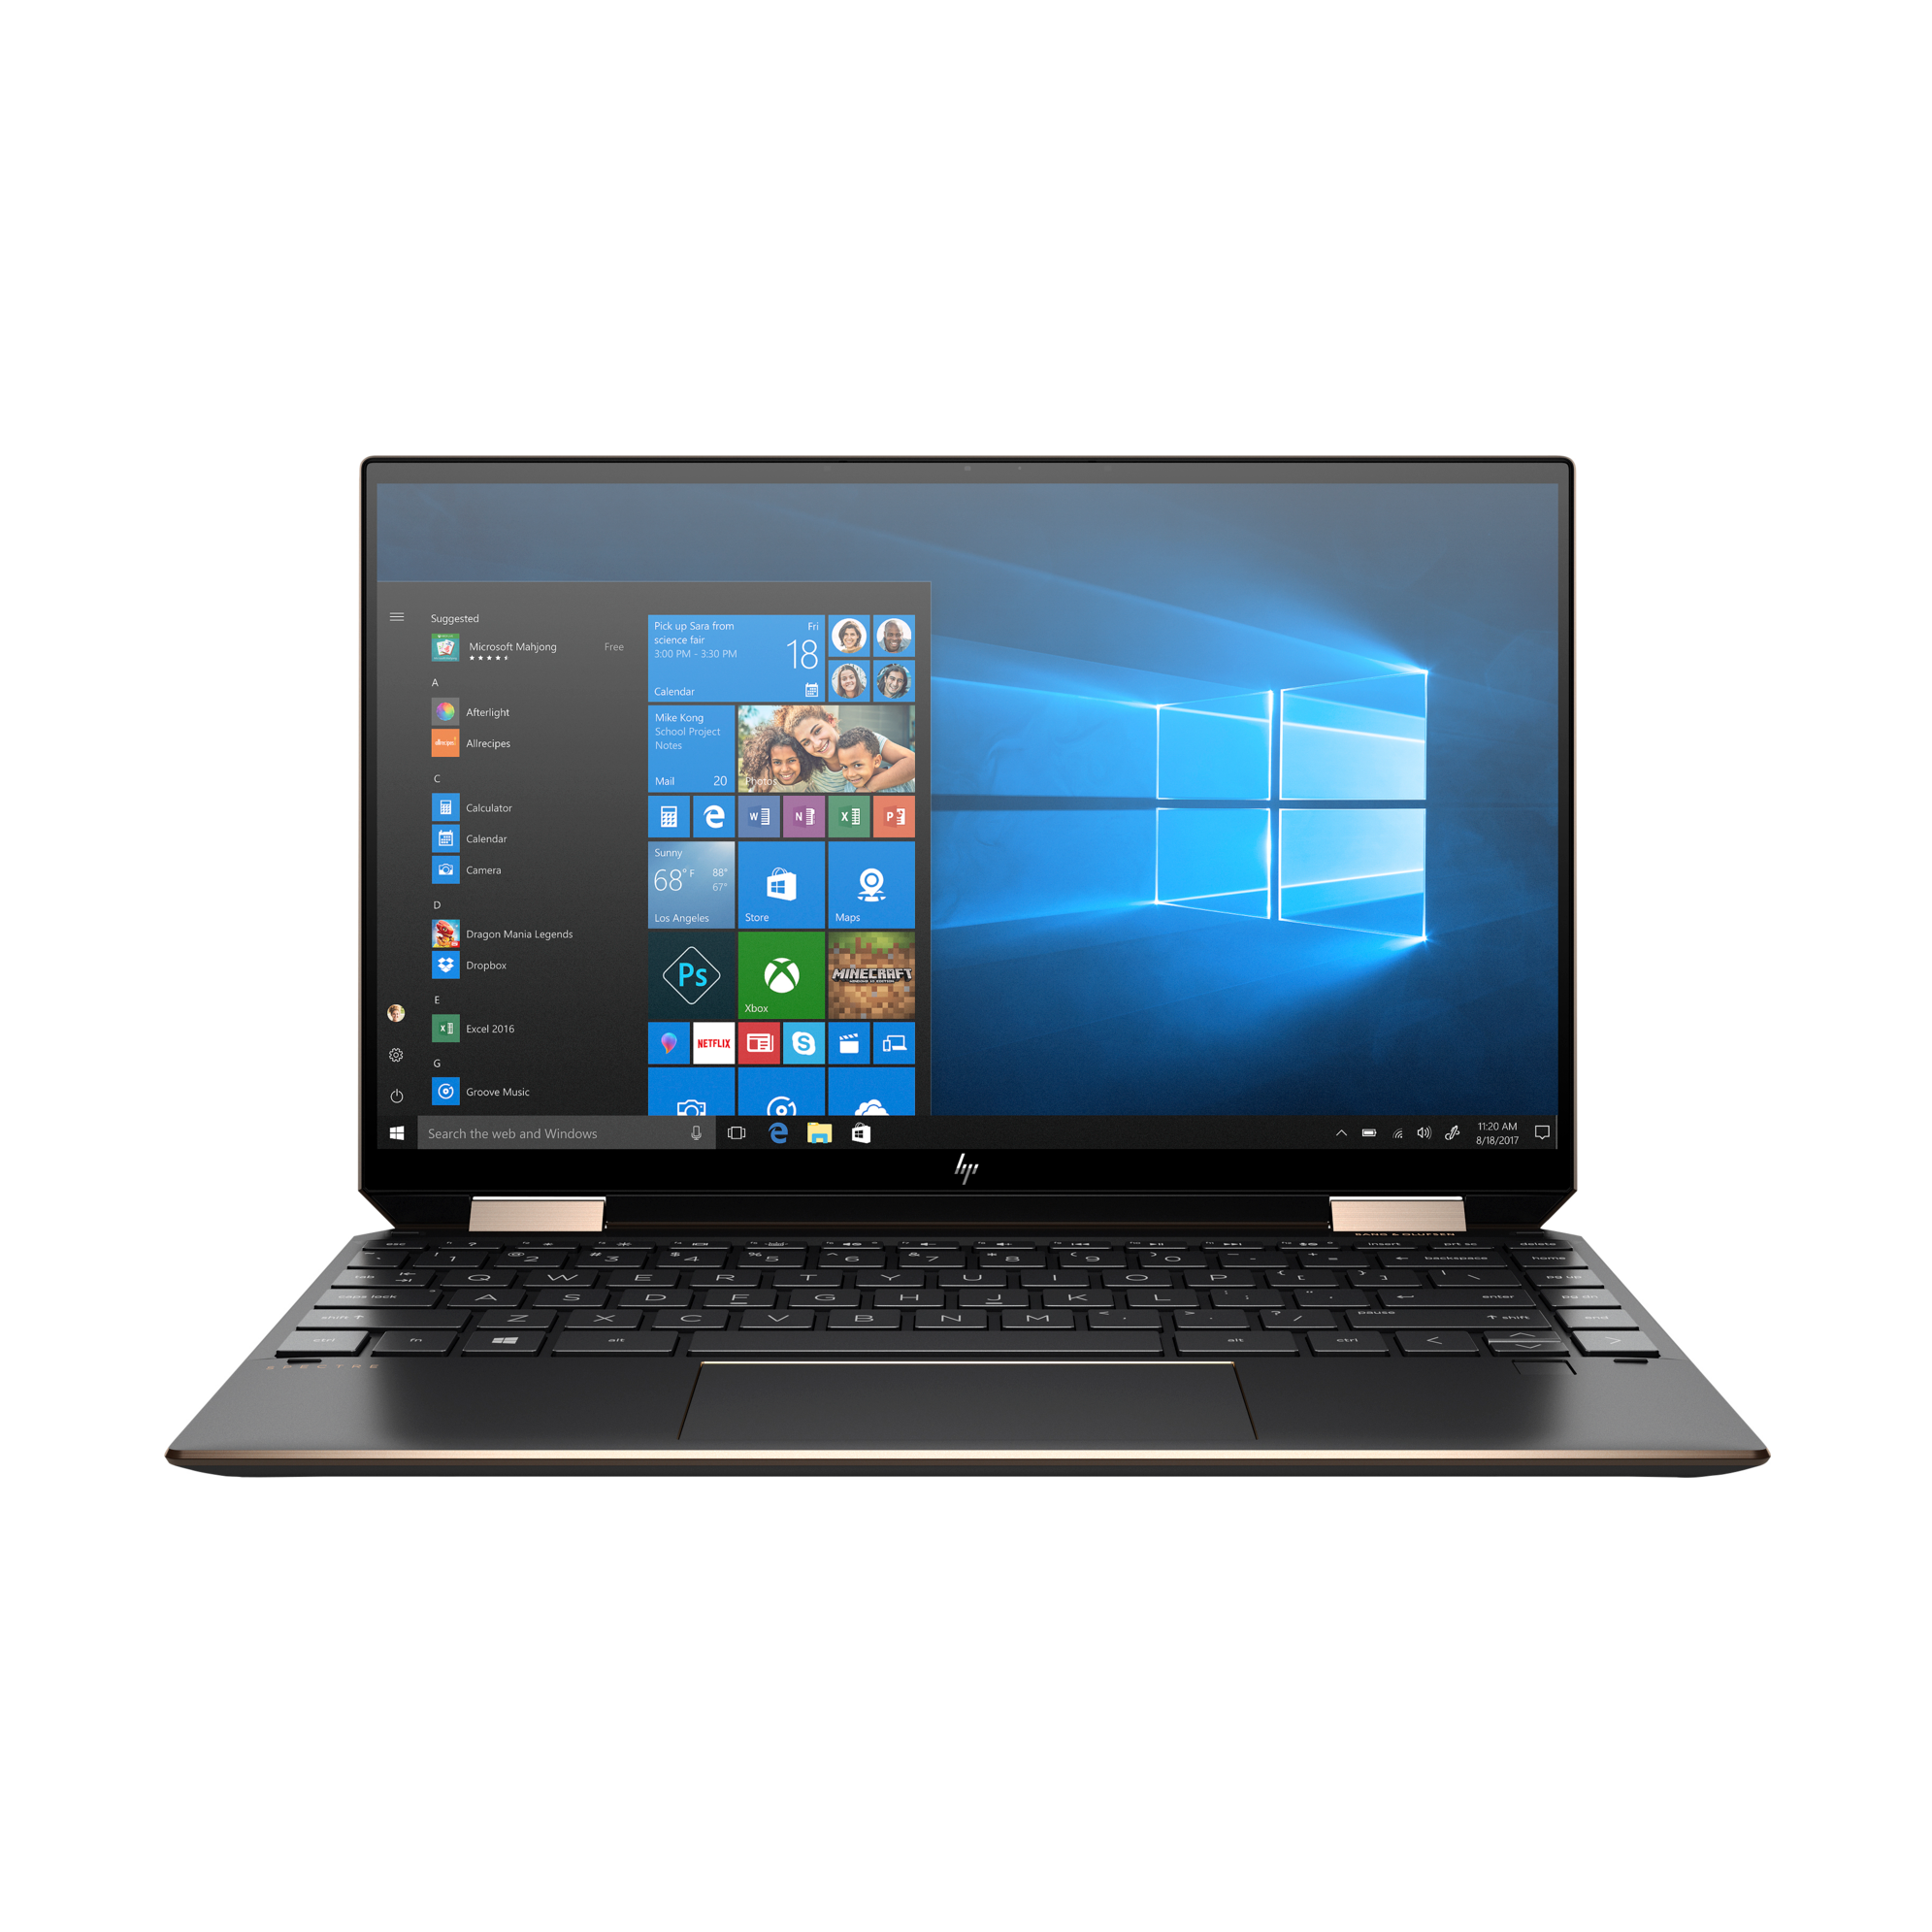 Ноутбук трансформер HP Spectre x360 13 aw2024ur